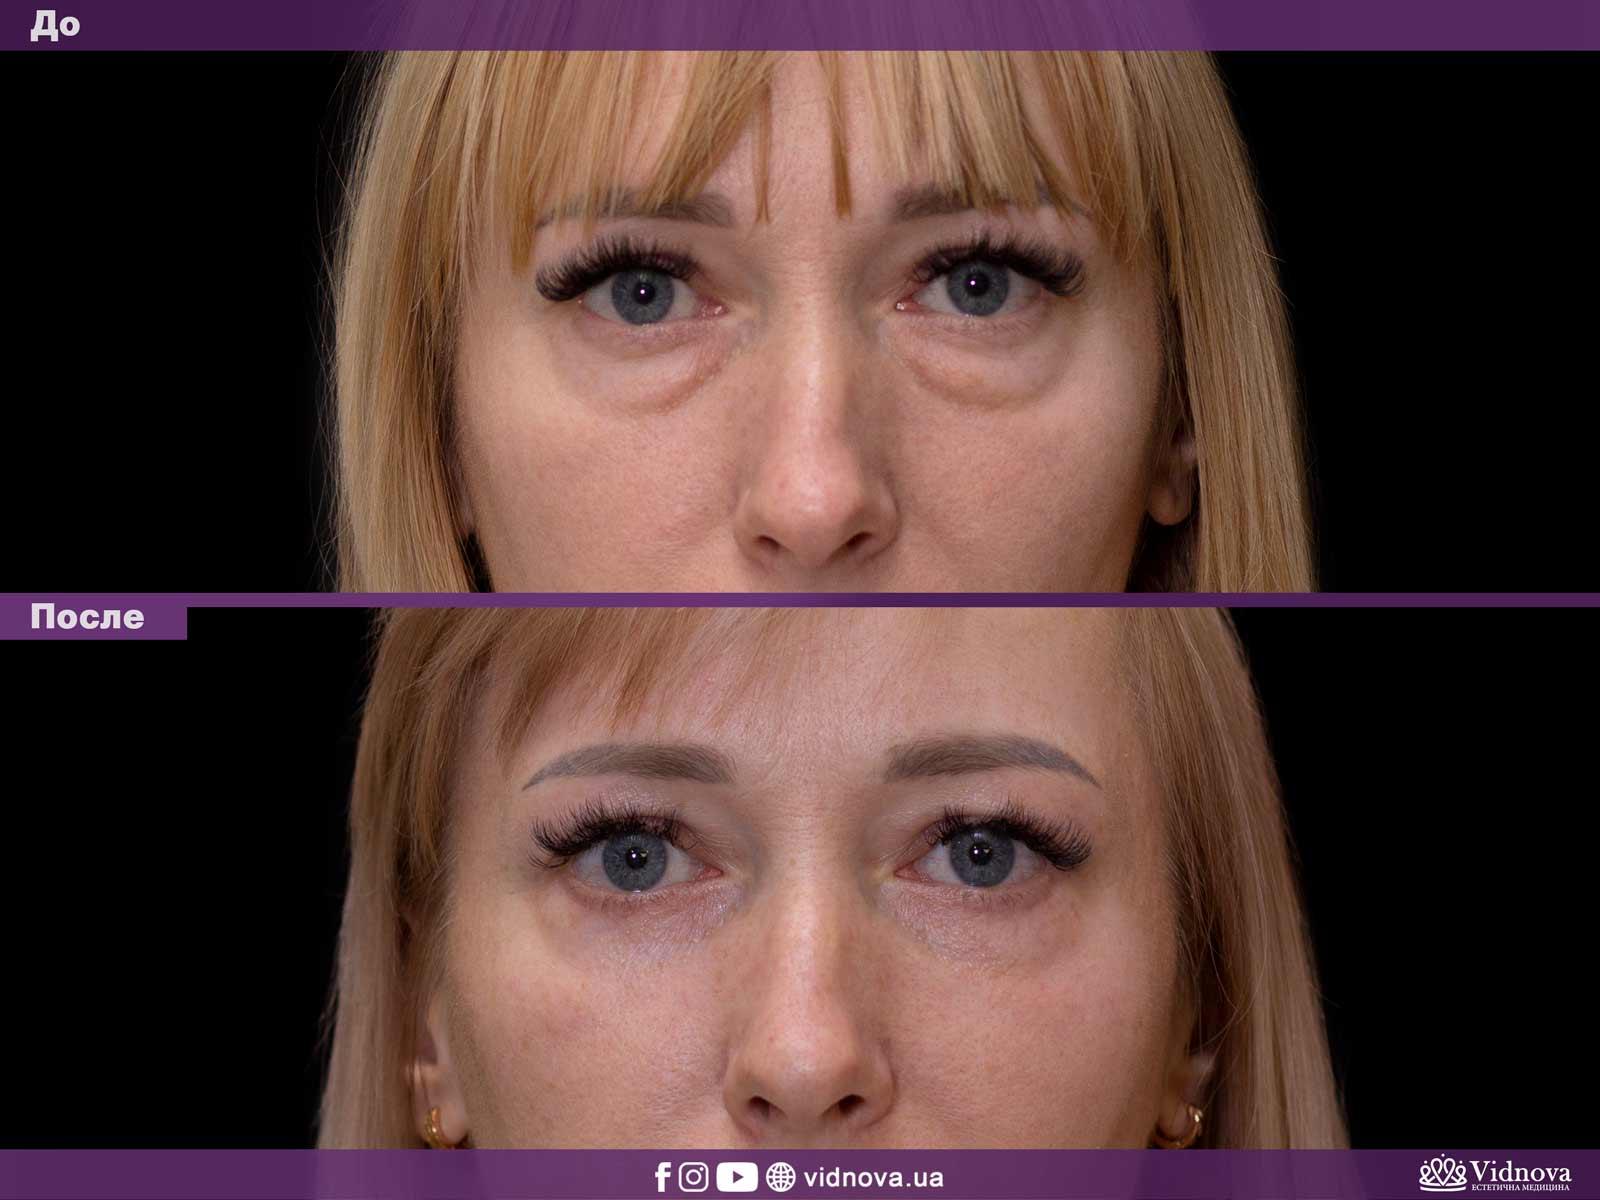 Блефаропластика: Фото До и После - Пример №24-1 - Клиника Vidnova